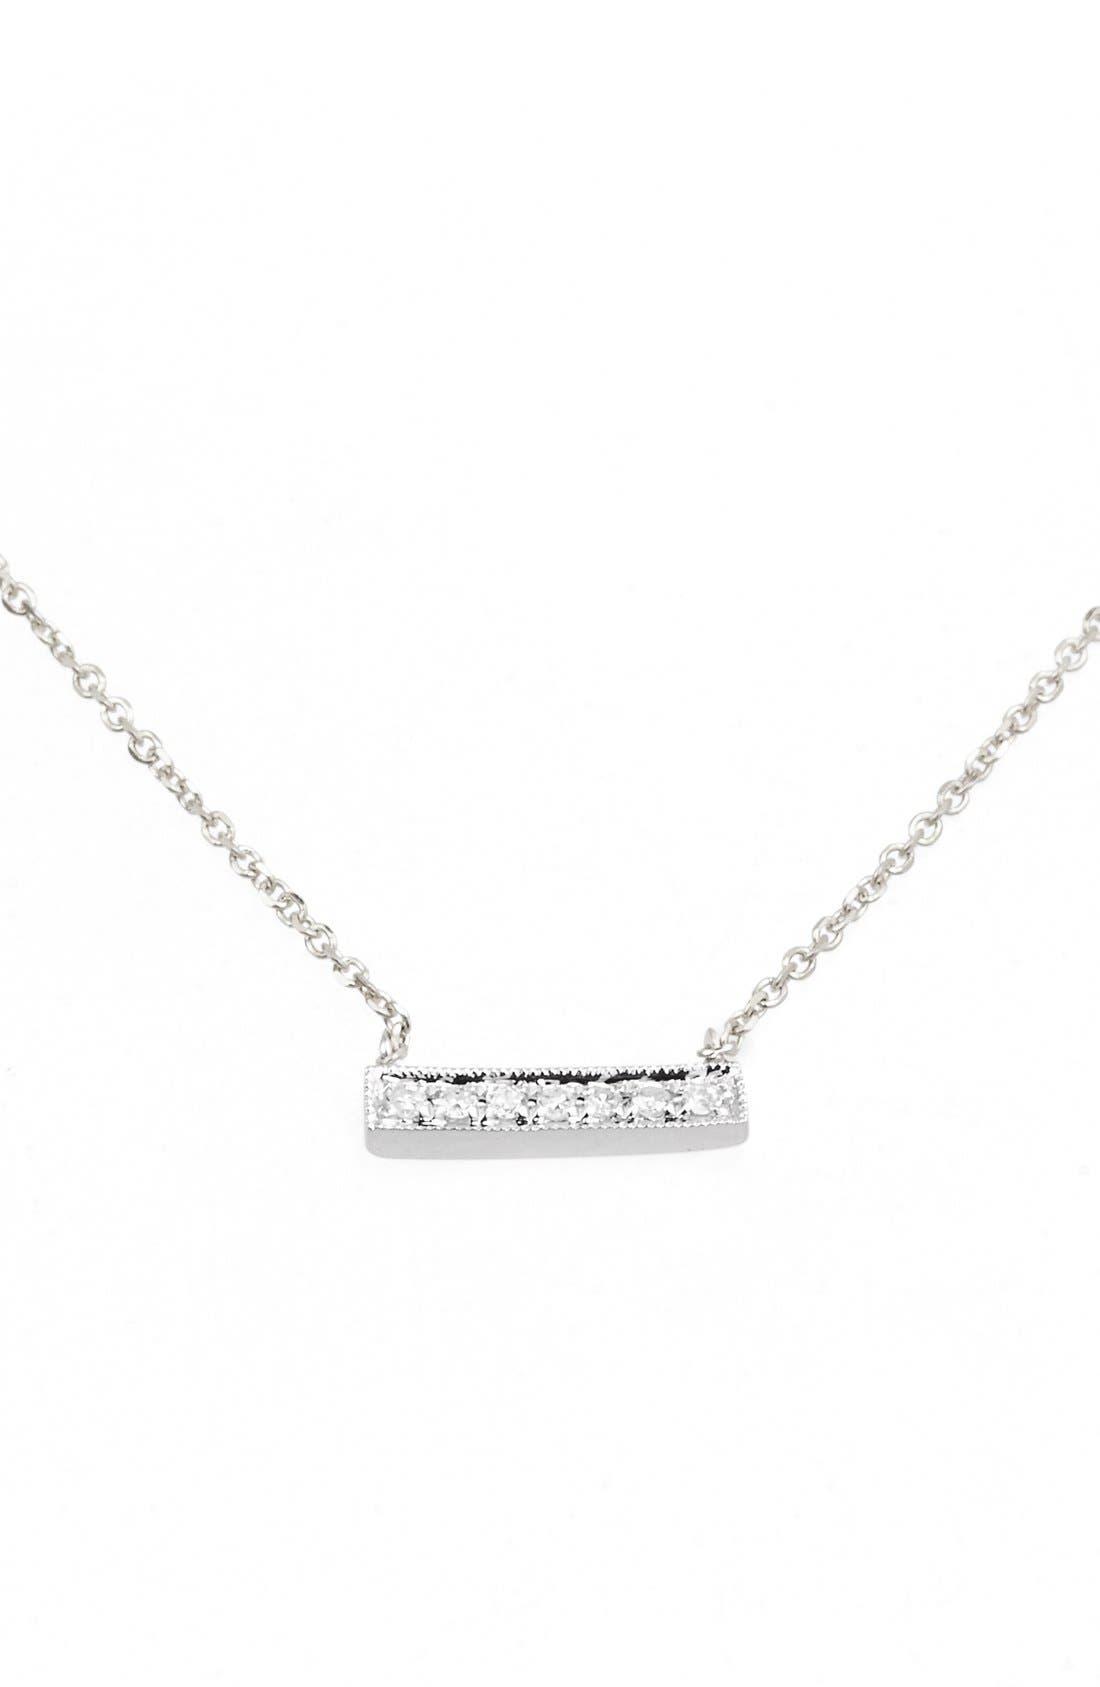 Main Image - Dana Rebecca Designs 'Sylvie Rose' Diamond Bar Pendant Necklace